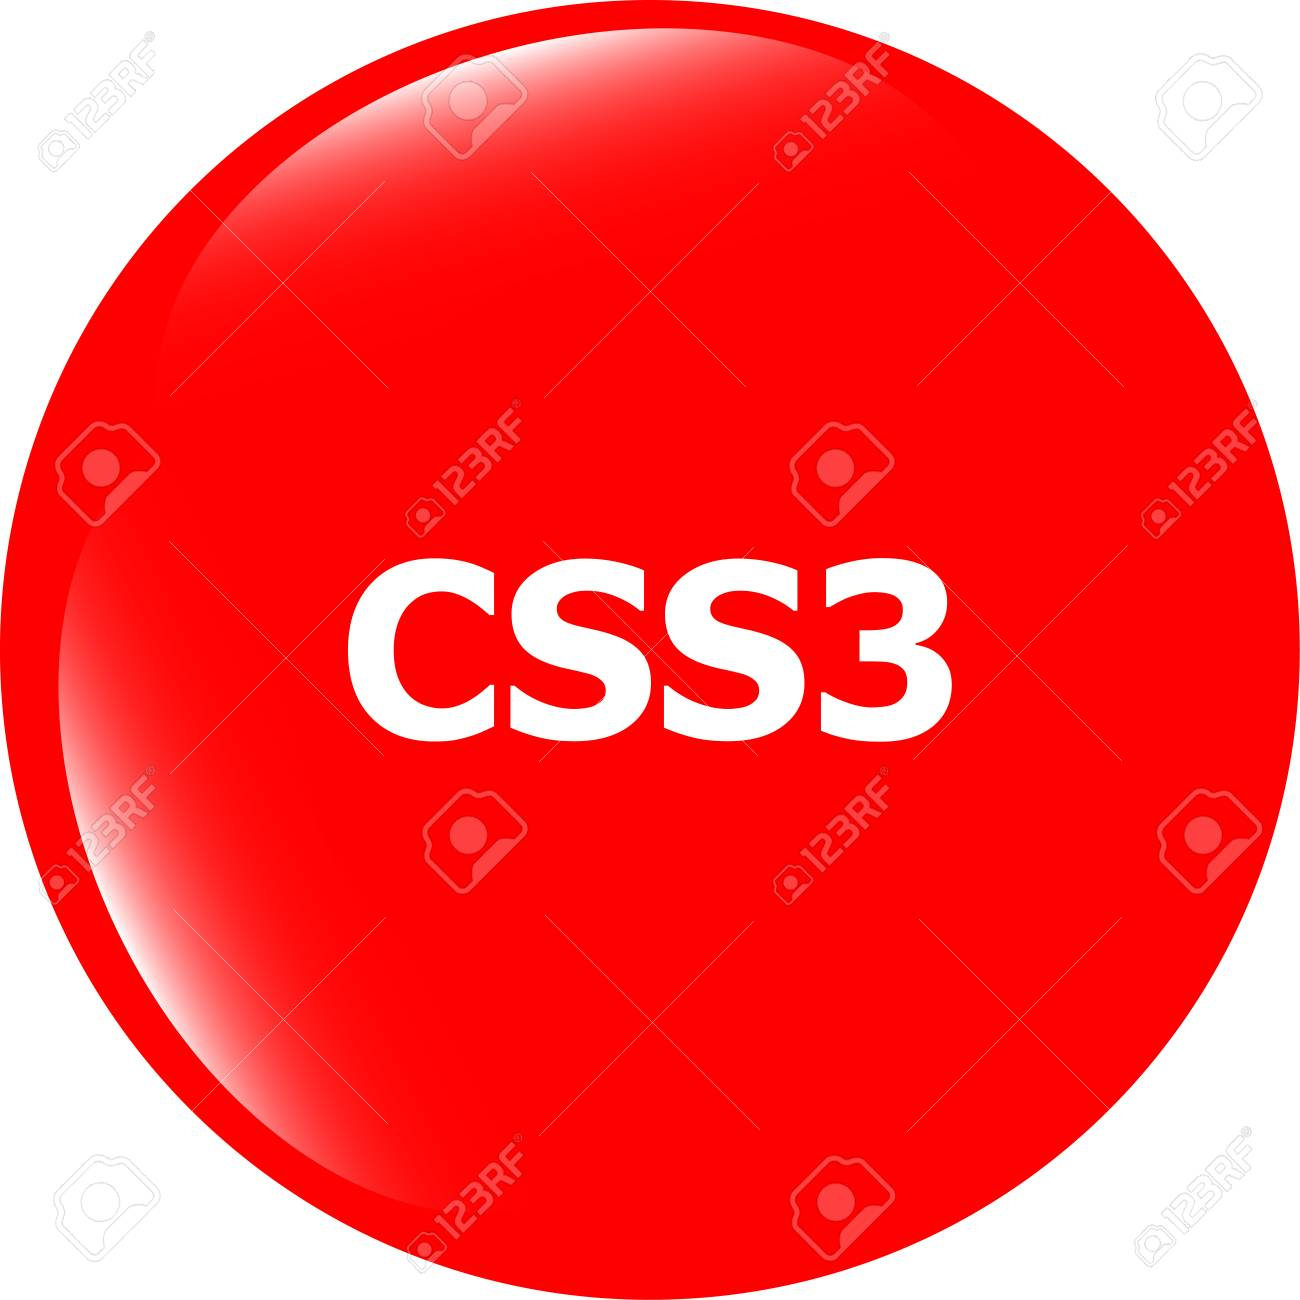 css style web icon isolated on white, web icon Stock Photo - 29178605